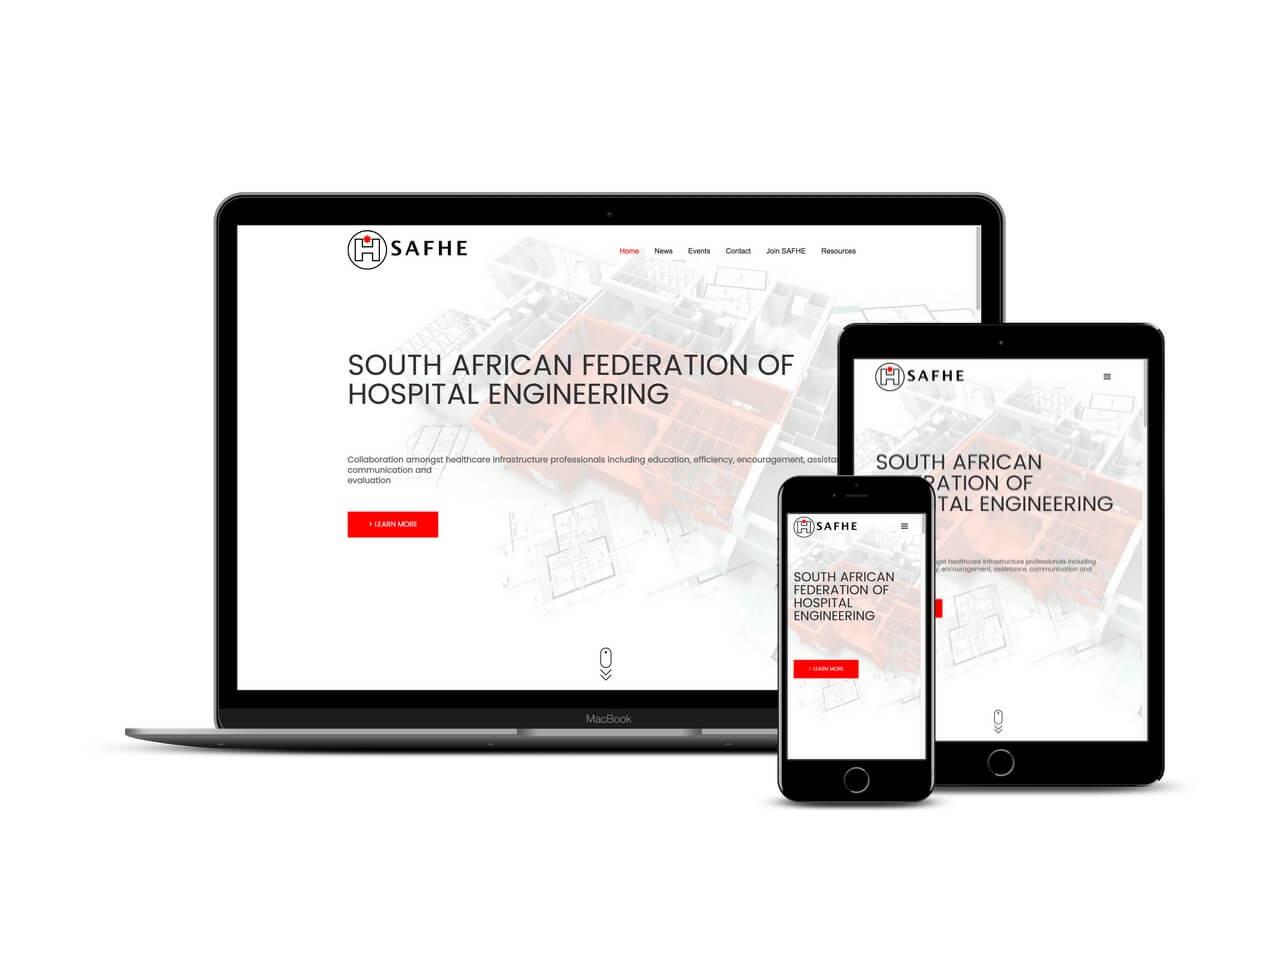 Custom Web Development Projects - SAFHE